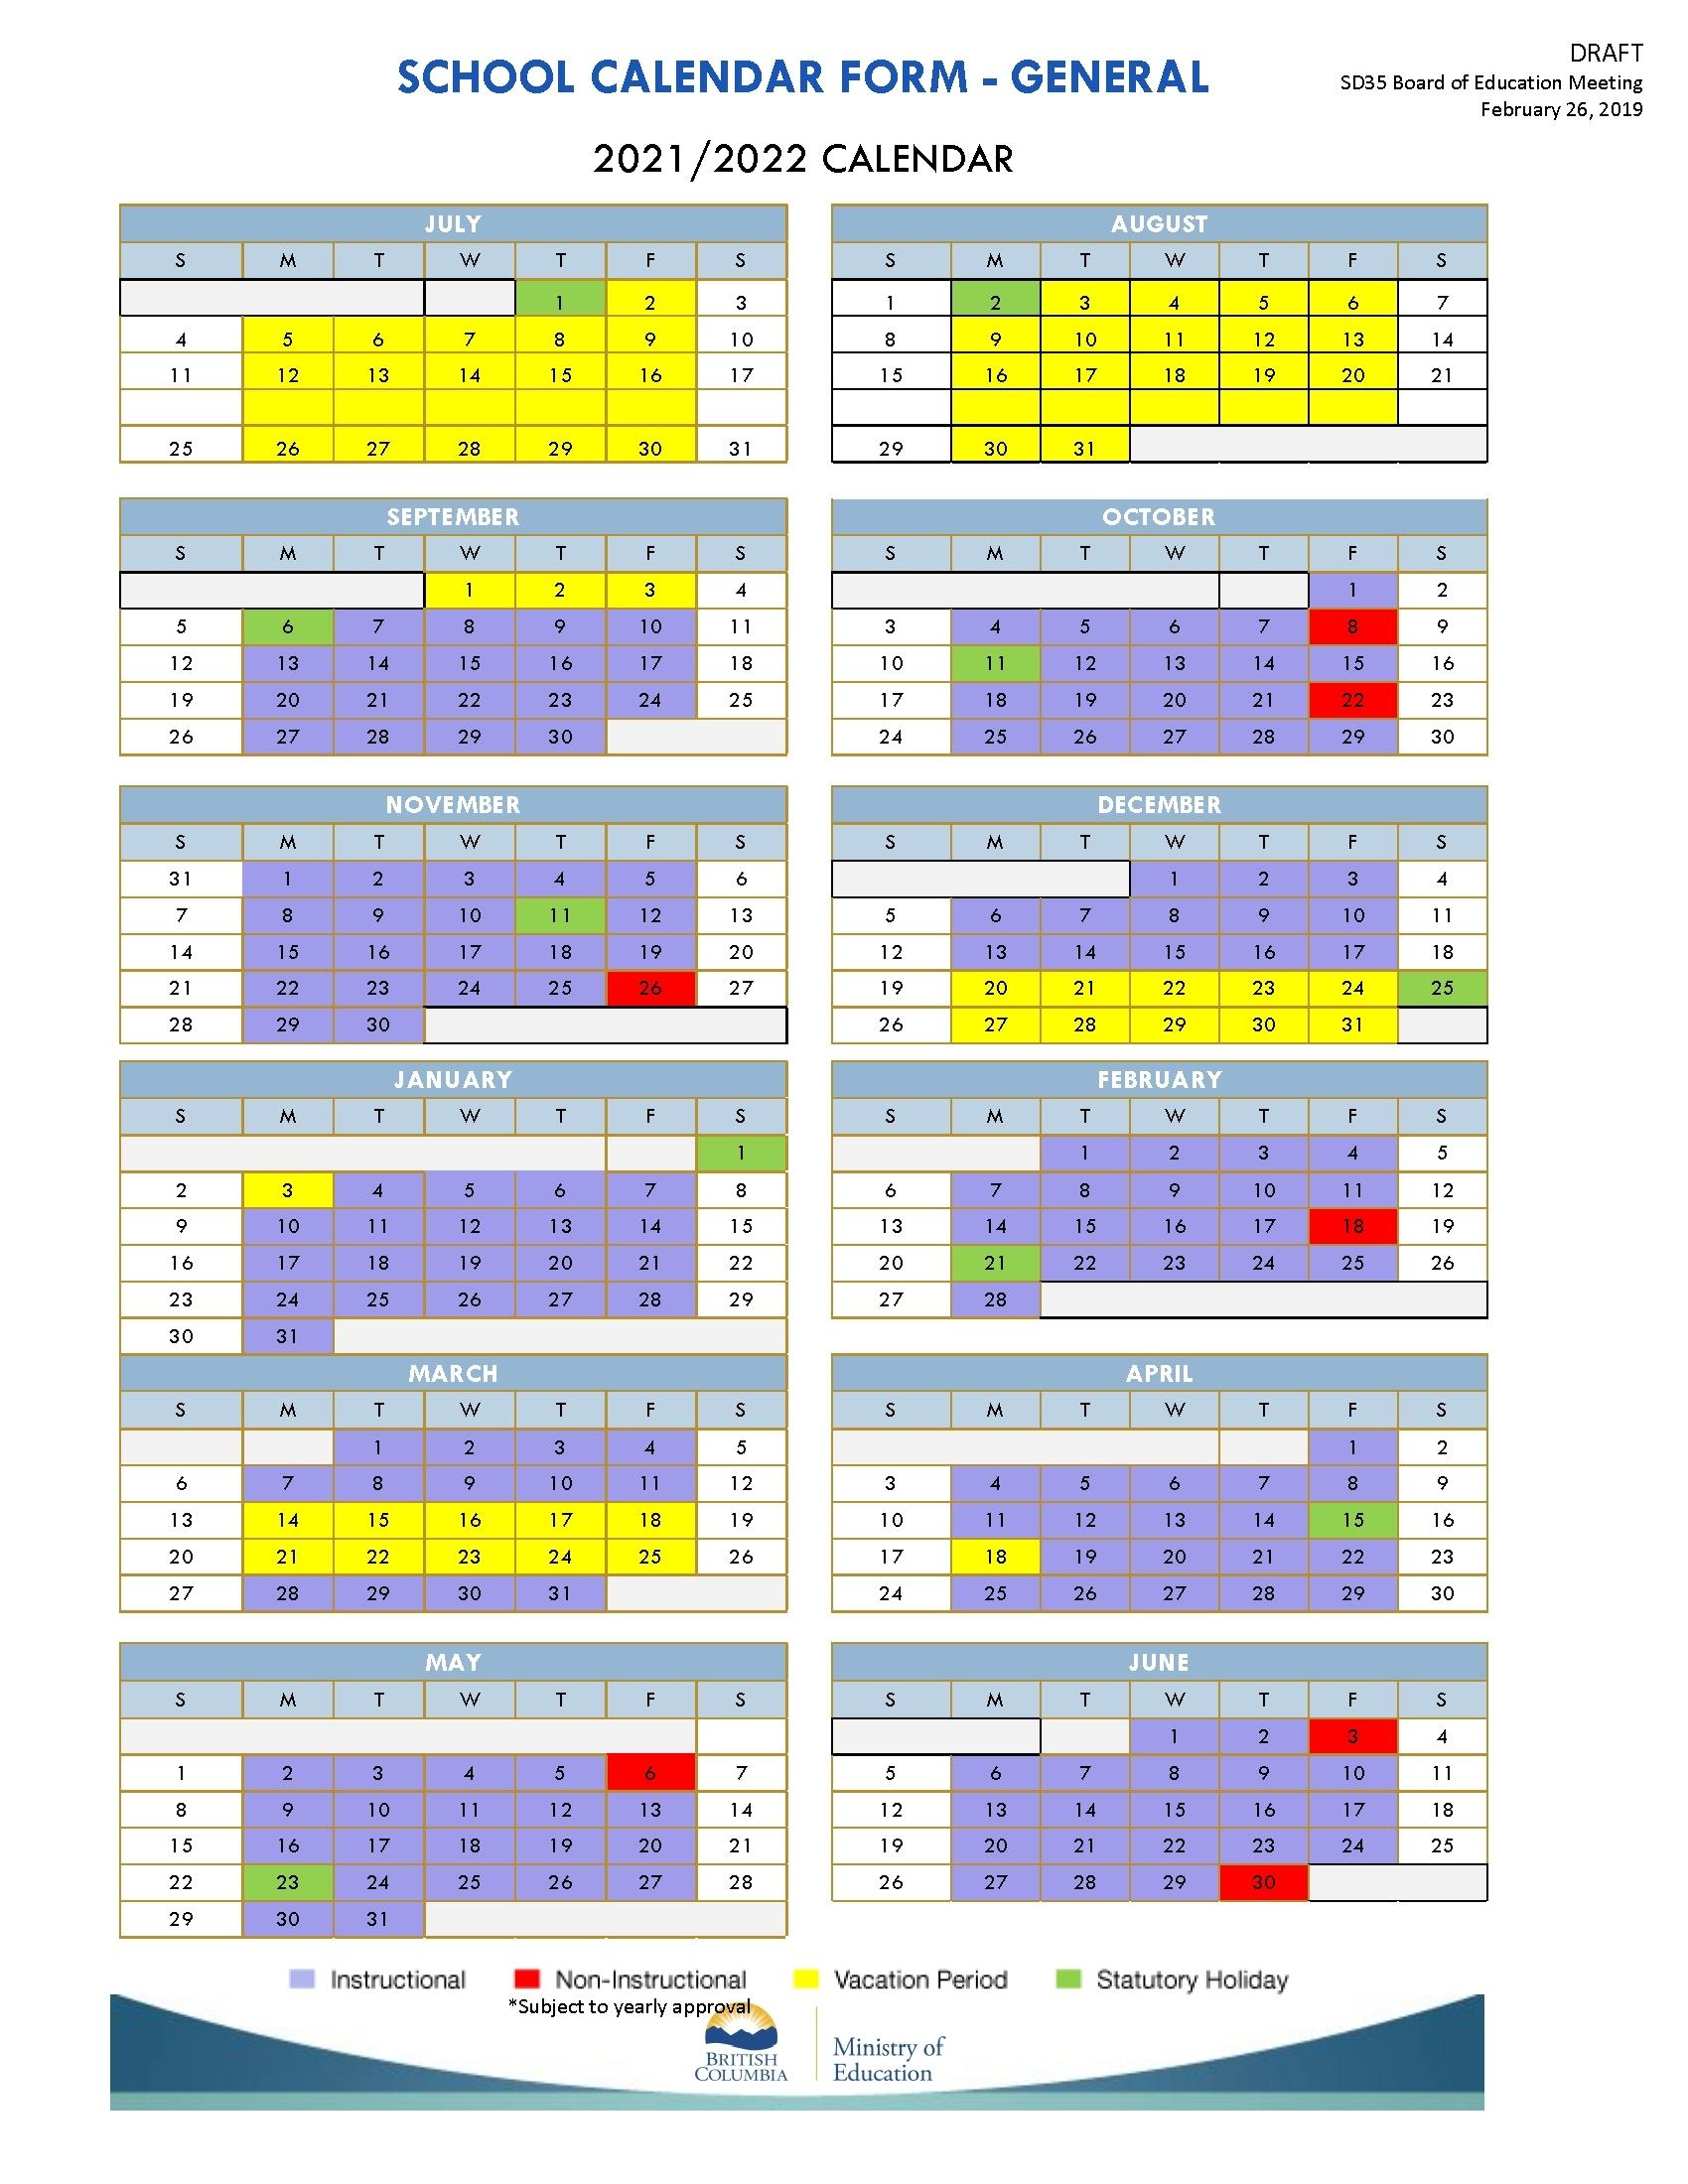 District Calendars 2019 2022 School District No 35   Qualads